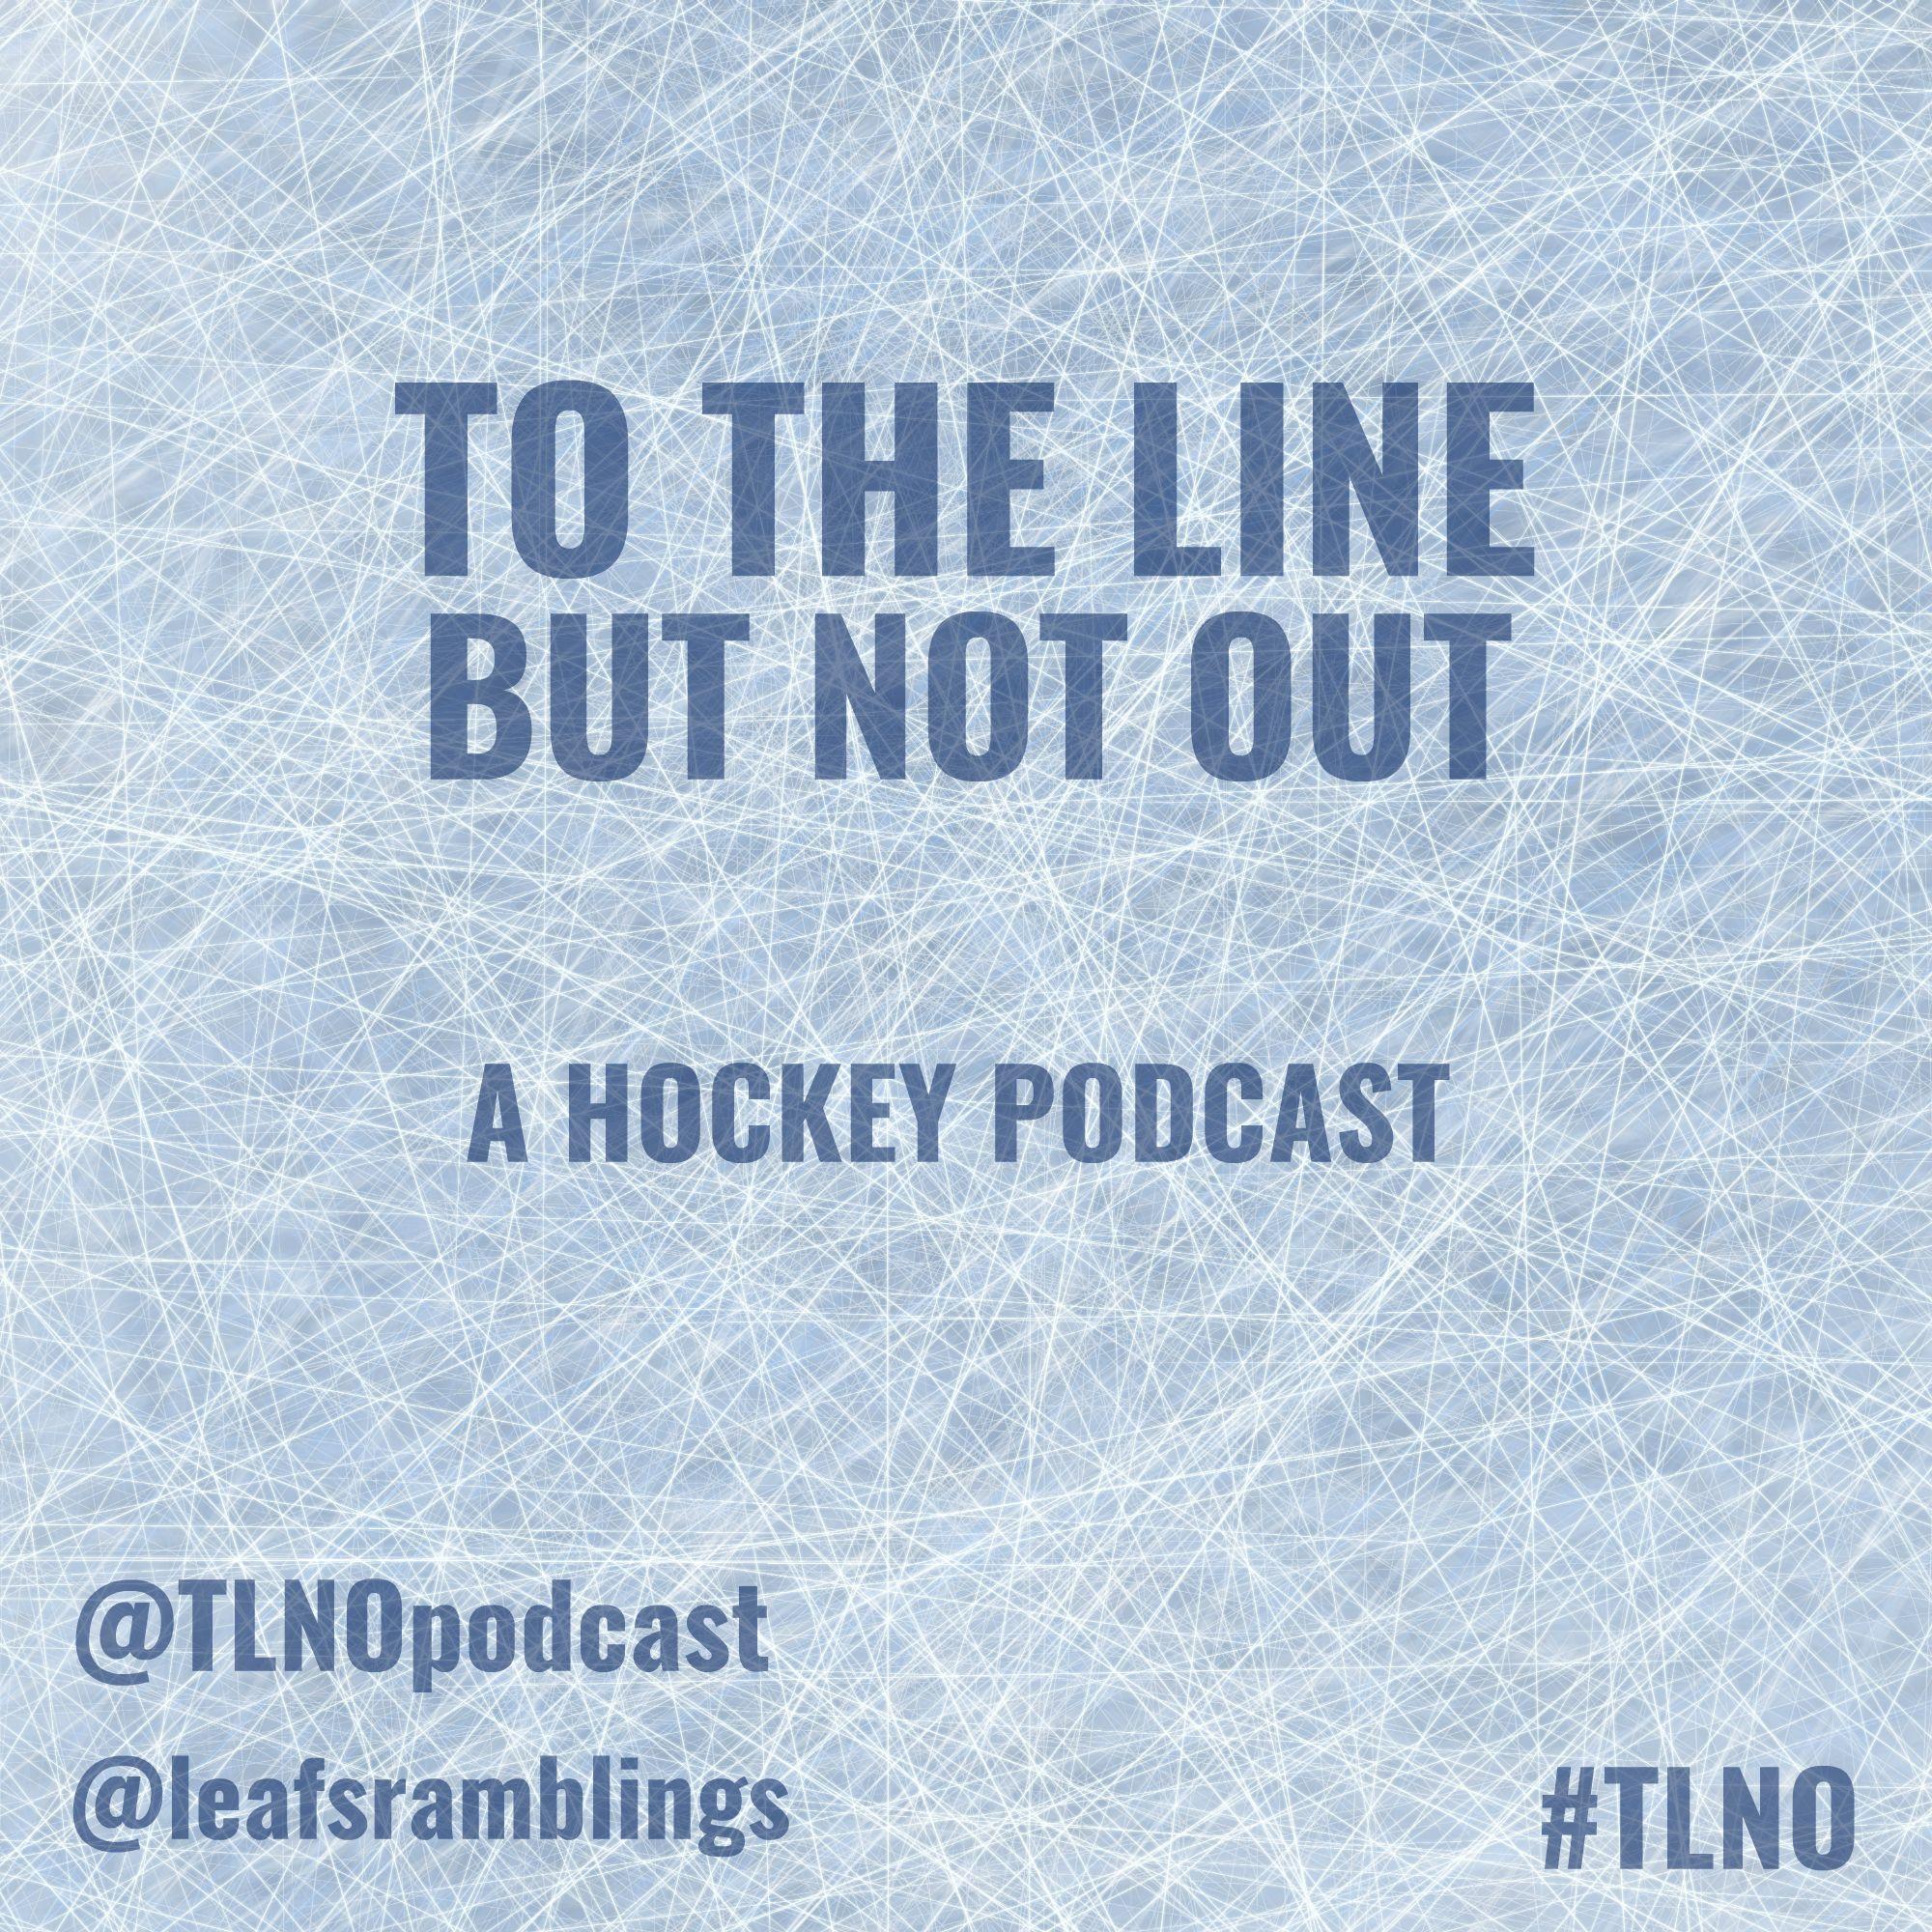 TLNO Episode 2 (2/11/16) - The D Boss